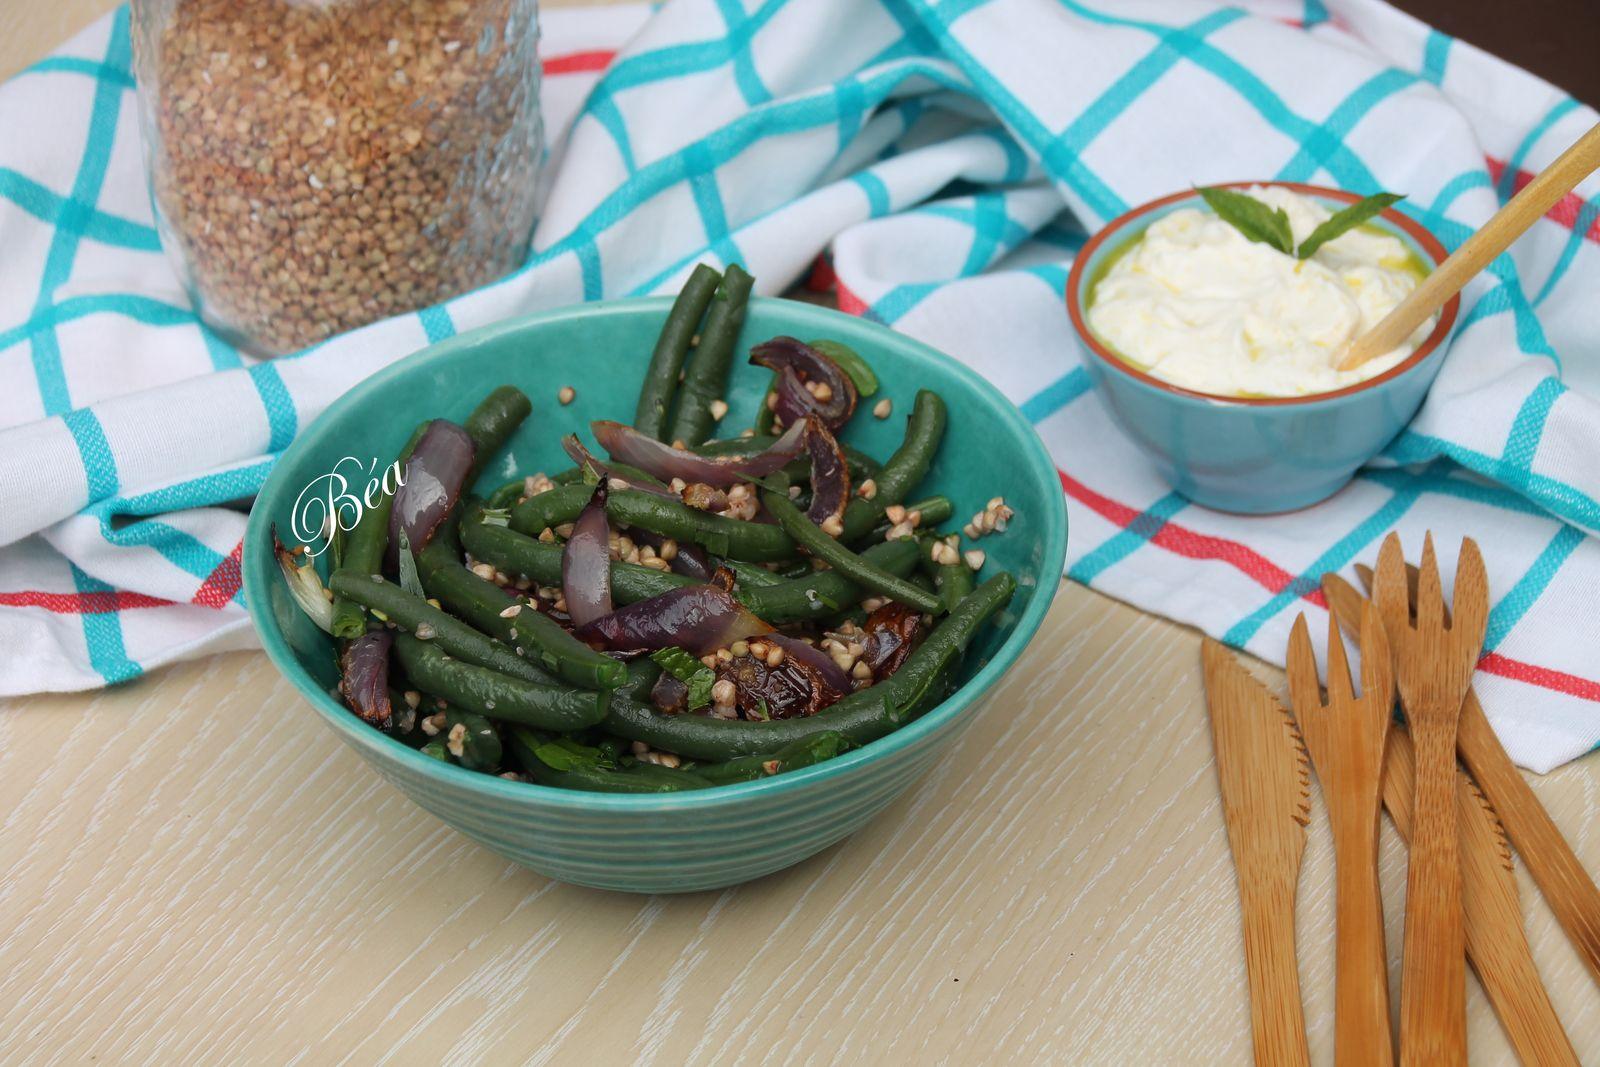 Salade de haricots verts au sarrasin (Ottolenghi)